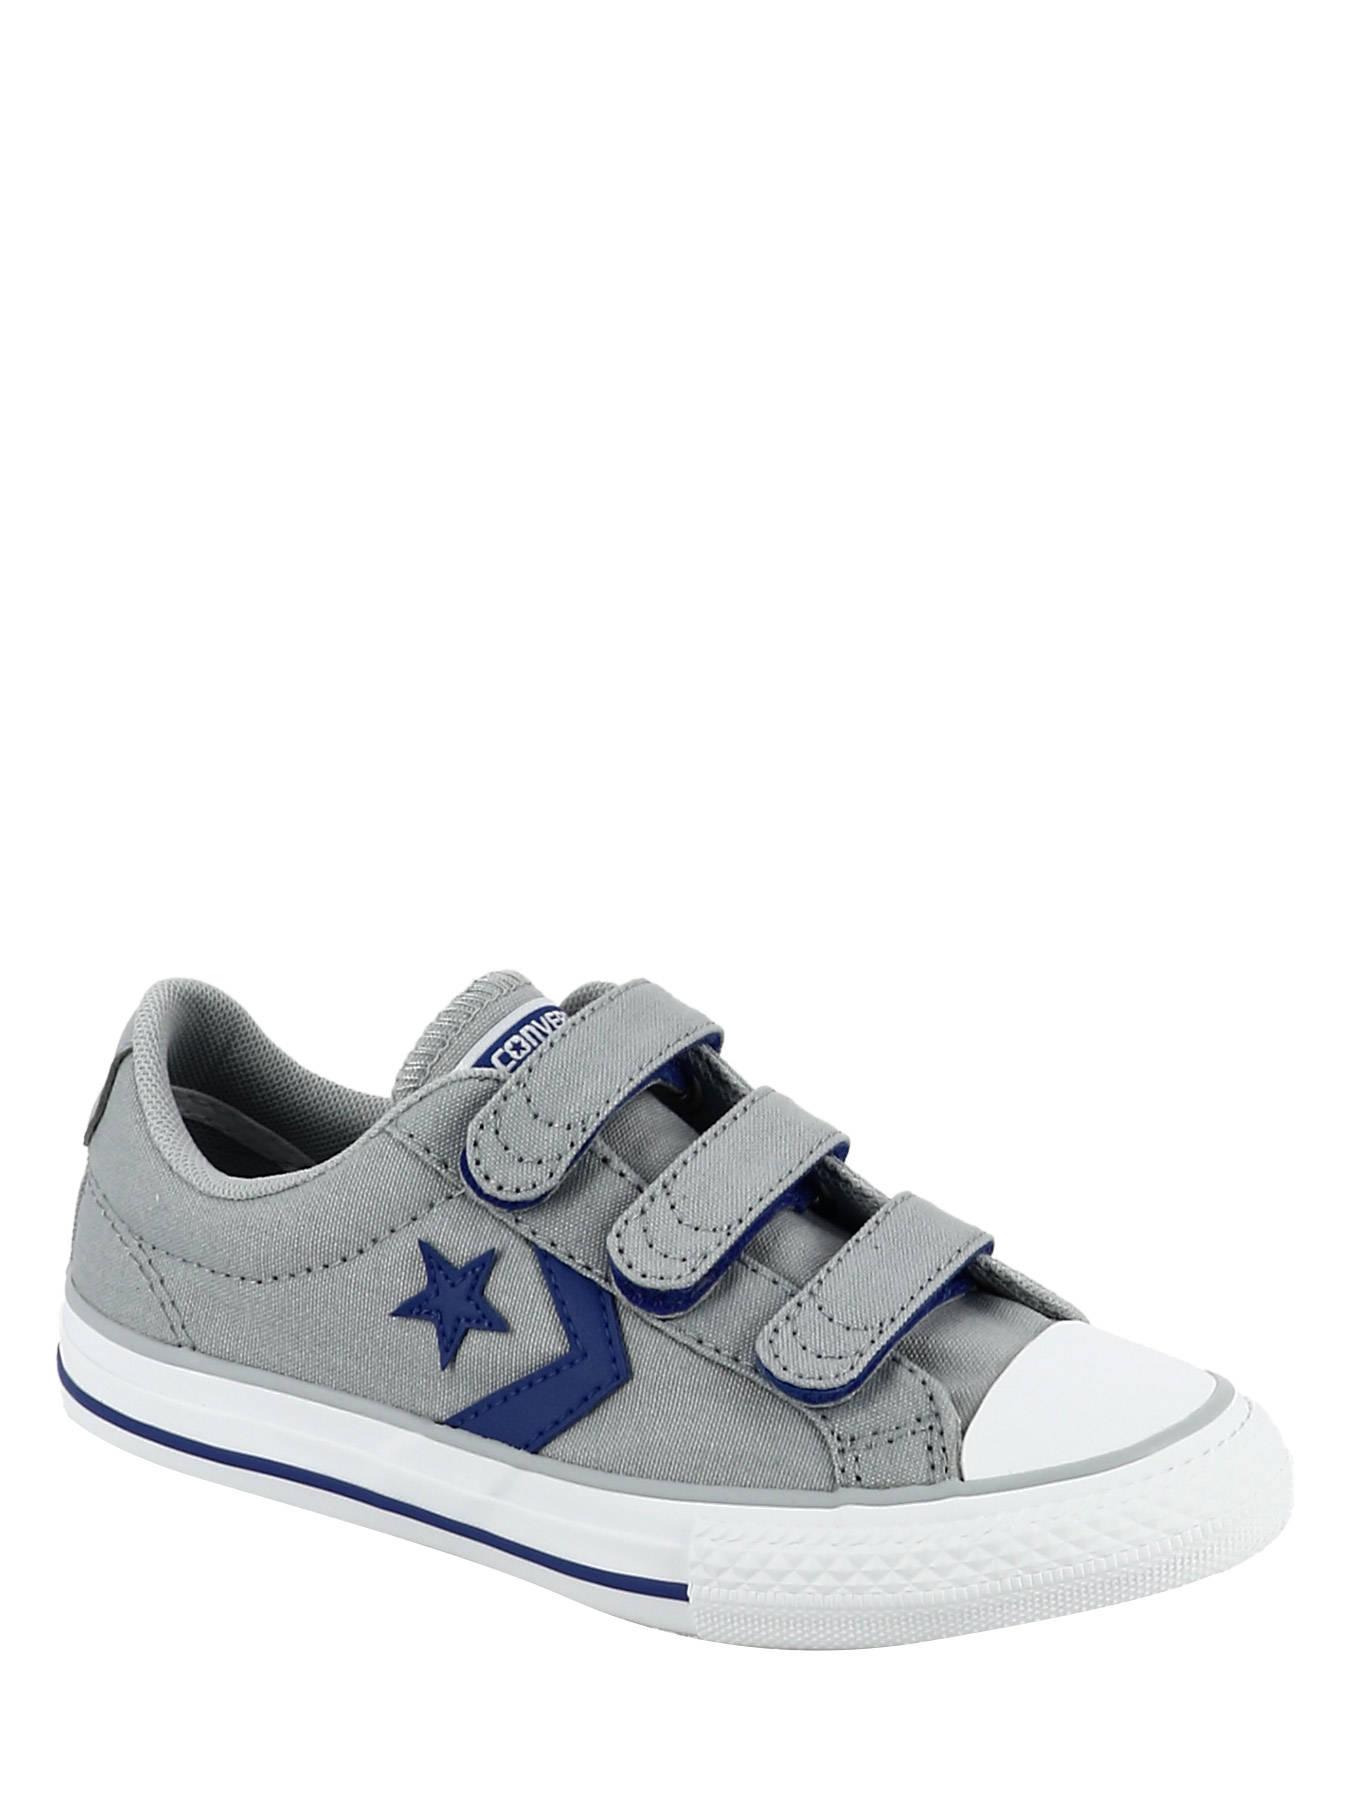 b296db211e378 Converse Sneakers SP EV 3V-OX WOL on edisac.com